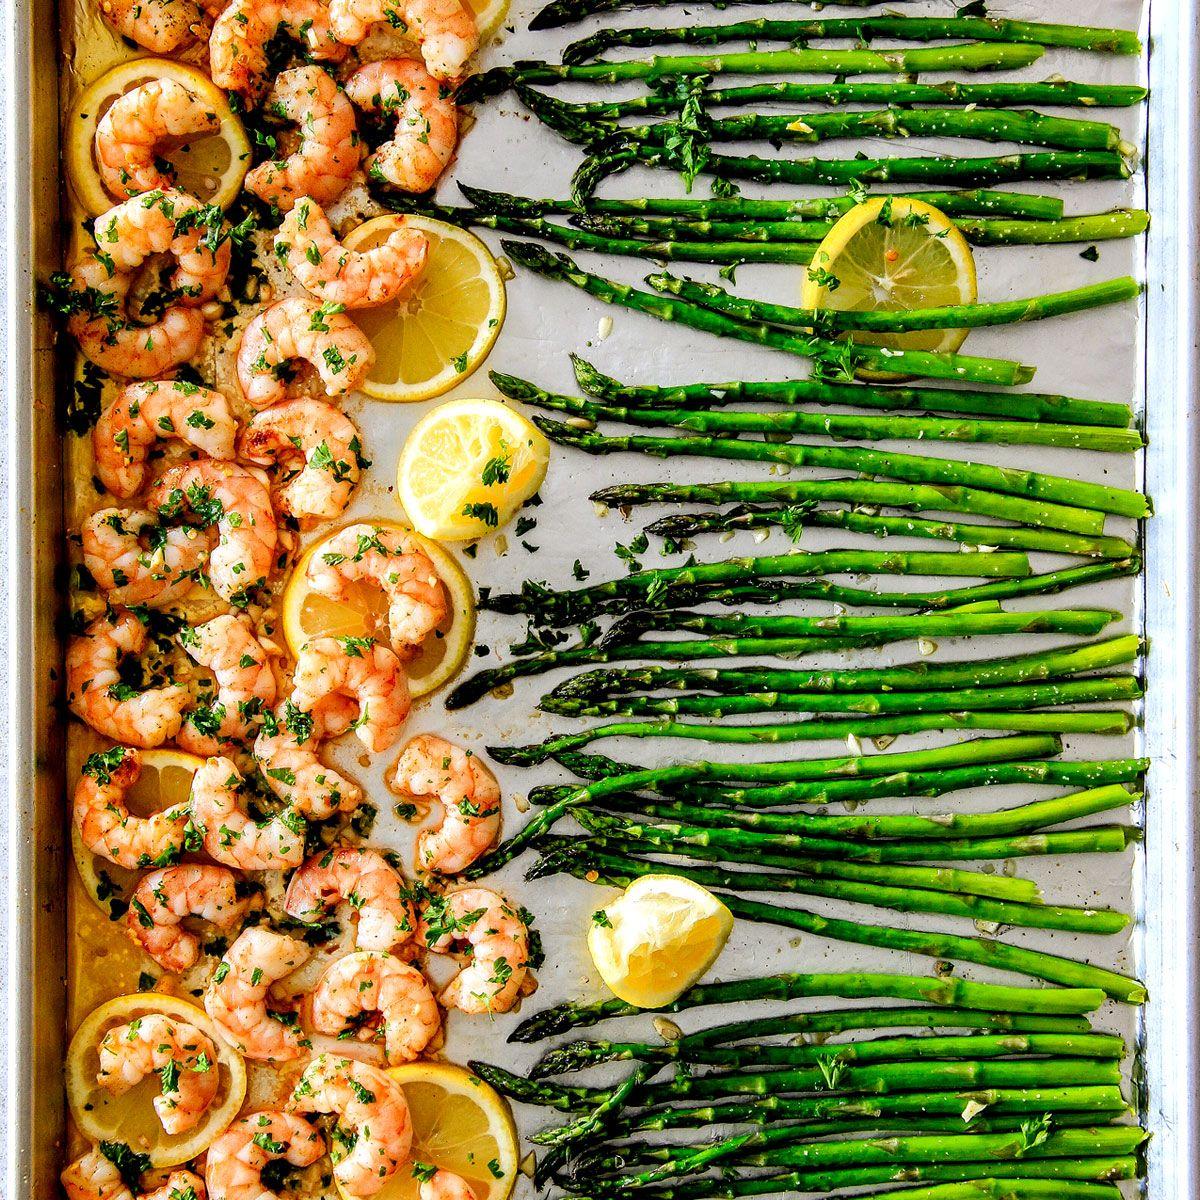 Sheet Pan Lemon Butter Garlic Shrimp and Asparagus